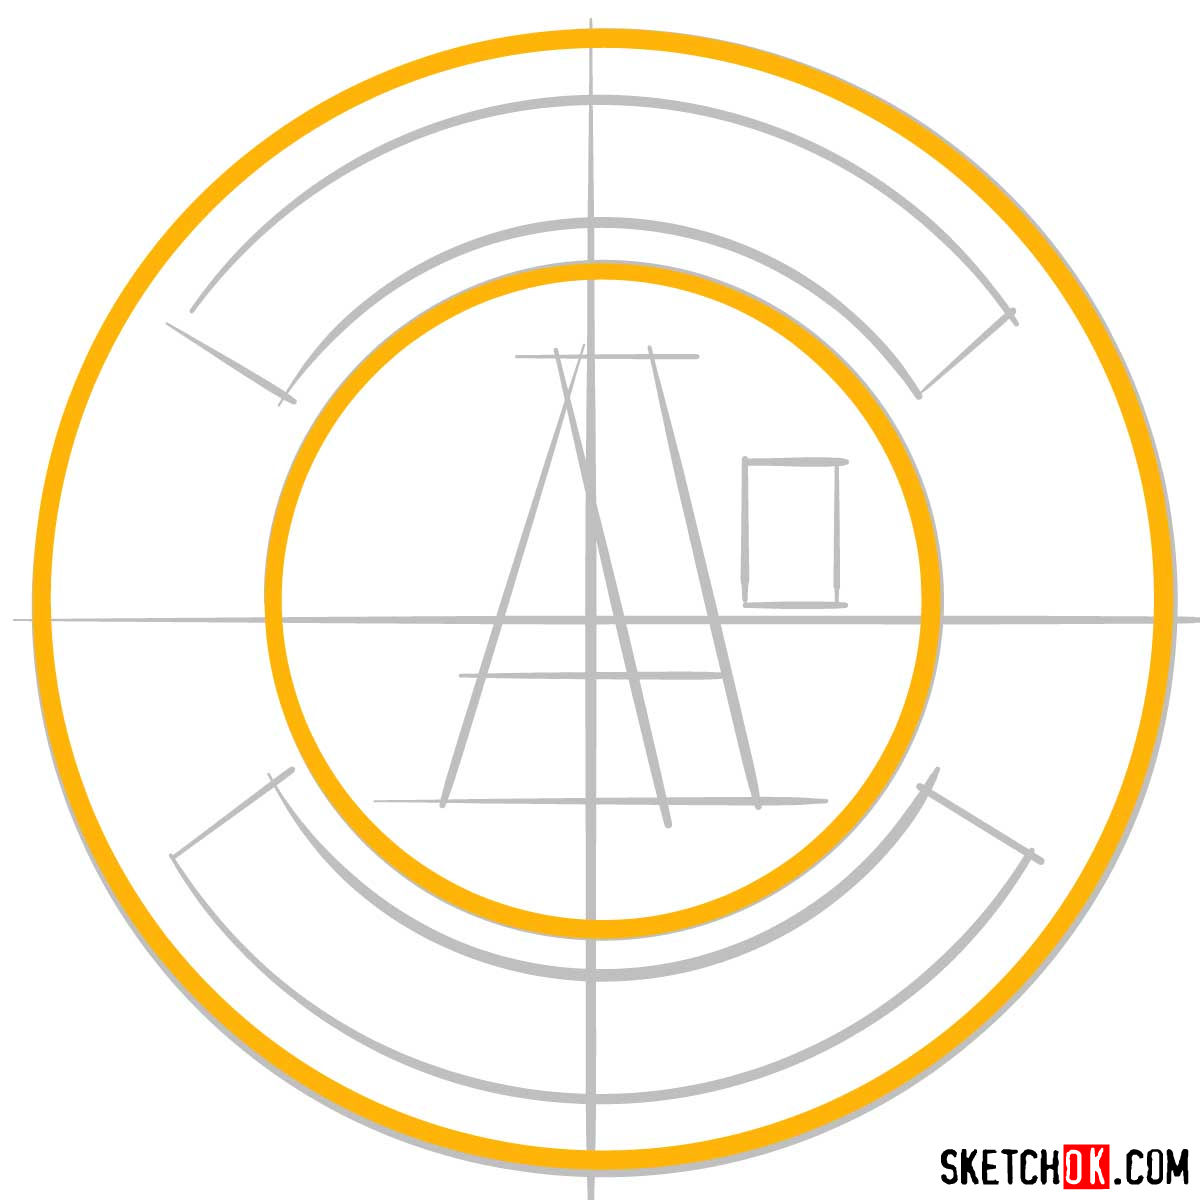 How to draw Oakland Athletics logo | MLB logos - step 03